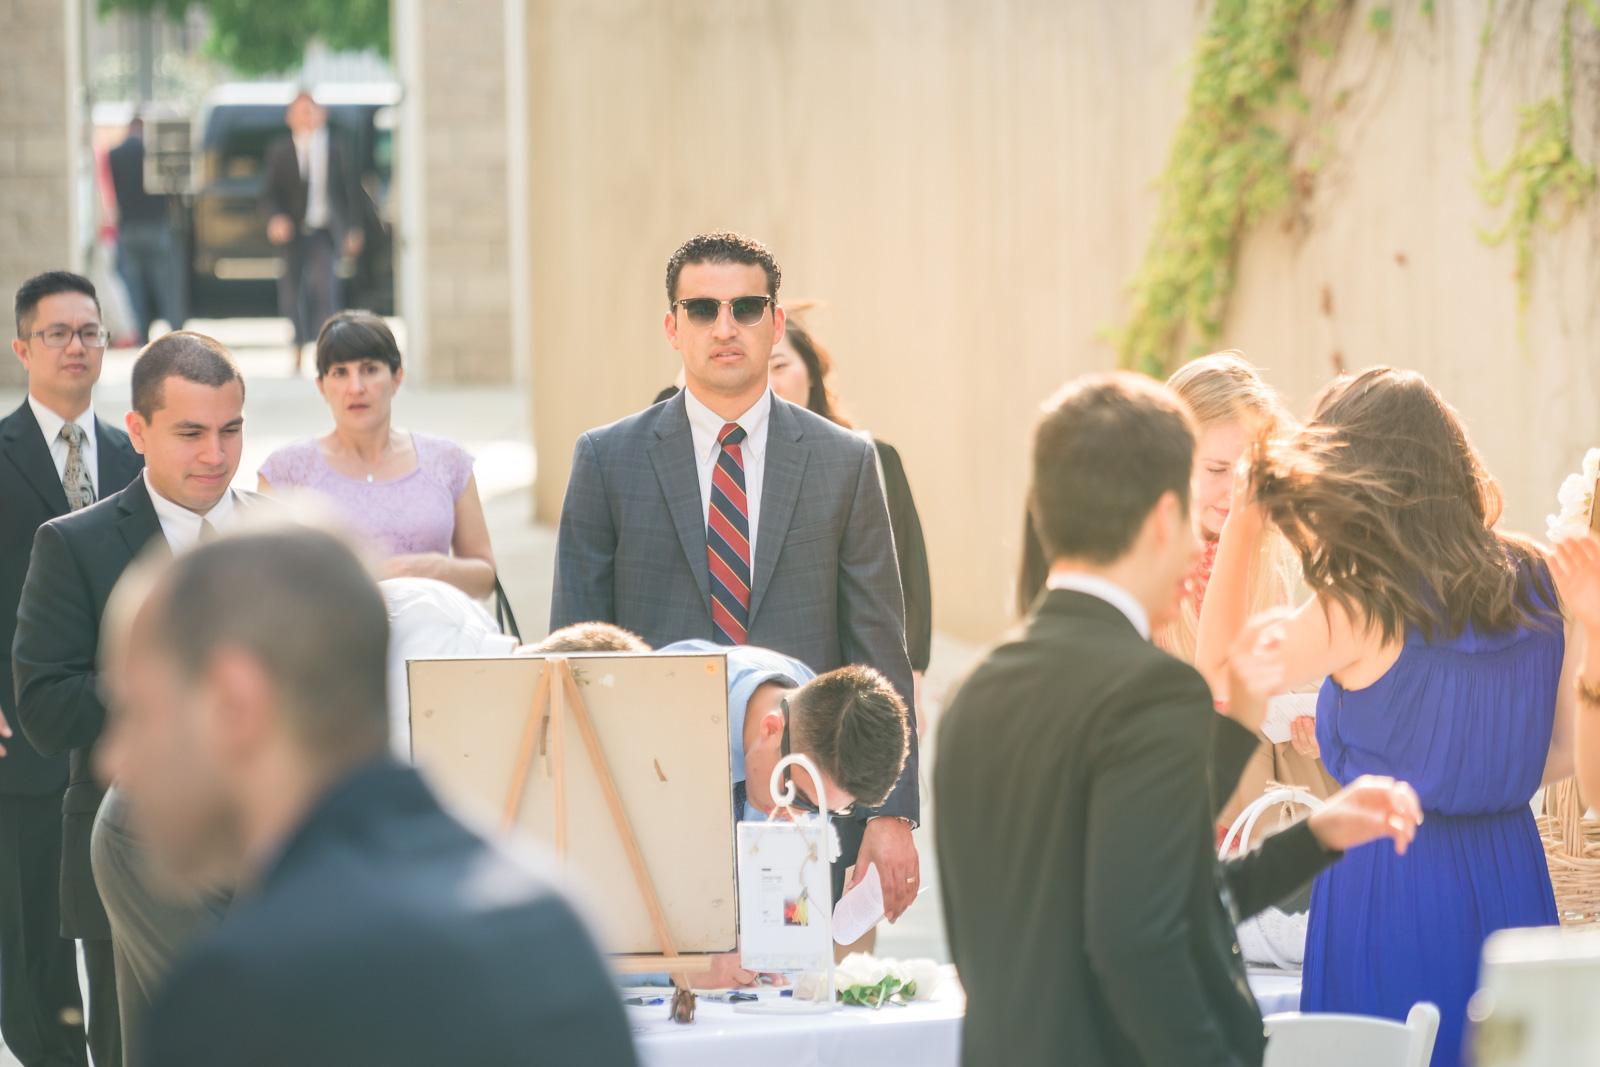 116_Angel-Brea-Orange-County_Joseph-Barber-Wedding-Photography.jpg